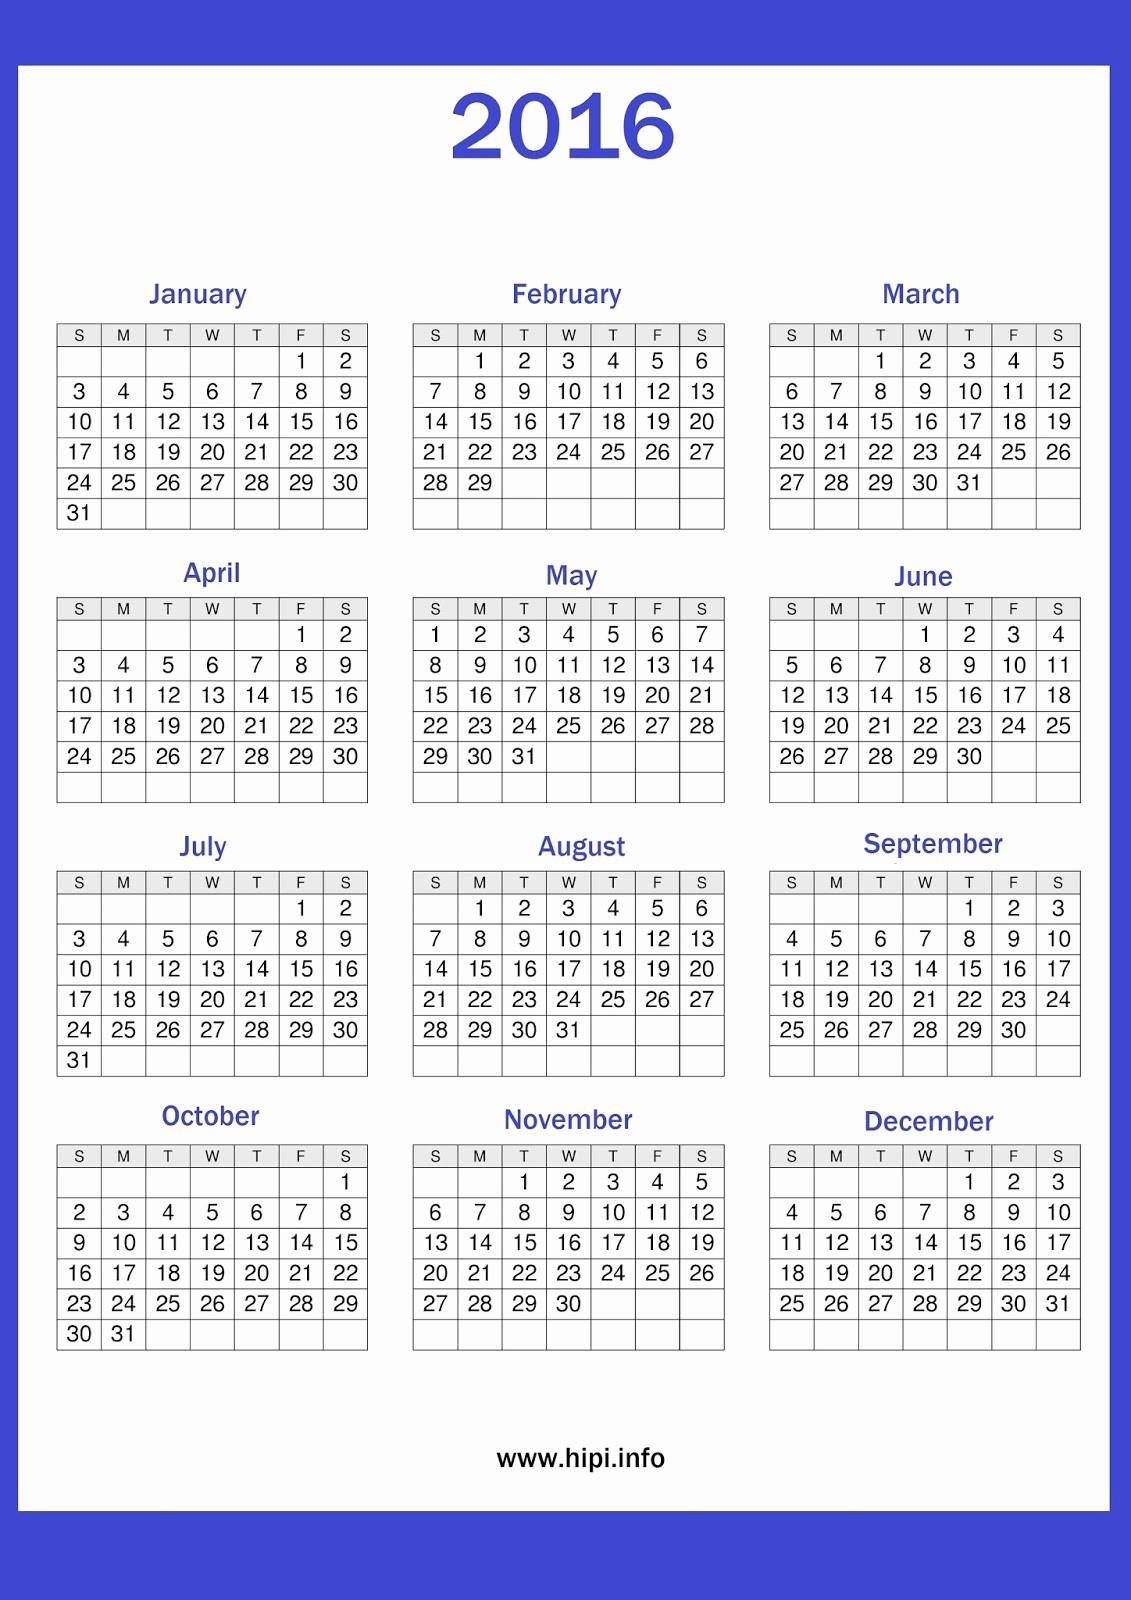 Free Downloadable 2016 Calendar Template Luxury Twitter Headers Covers Wallpapers Calendars